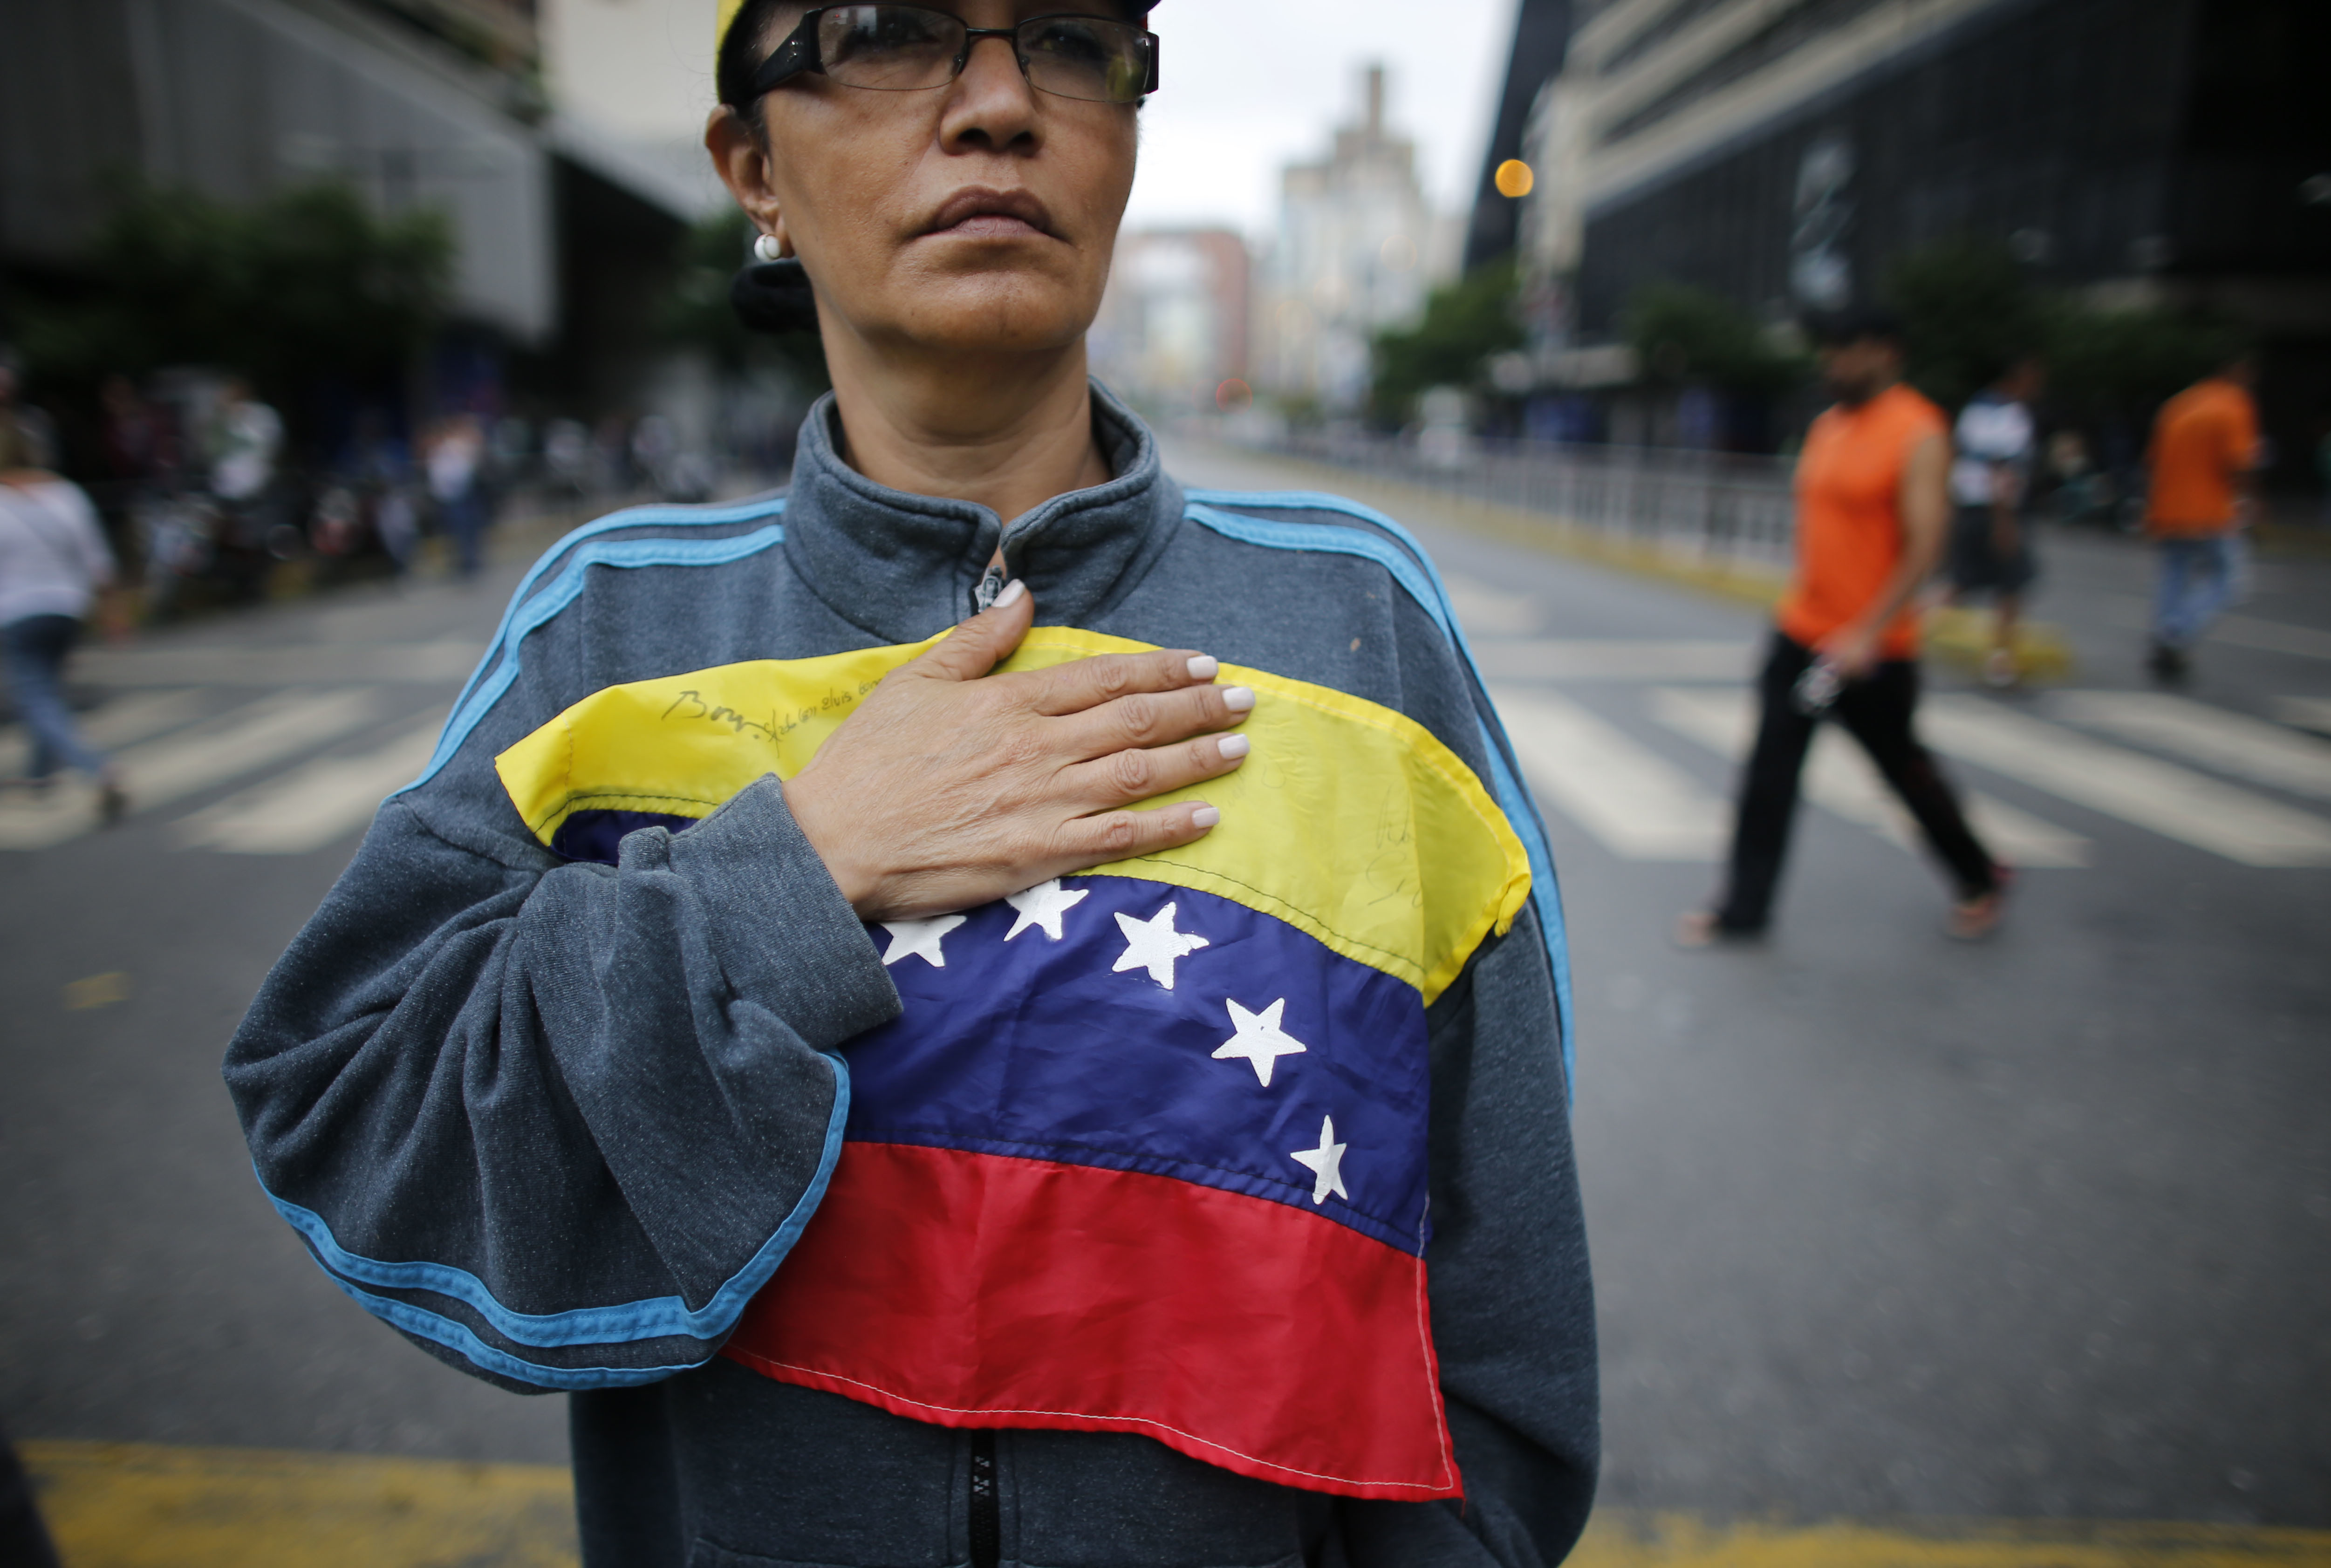 Sakharov Prize 2017 laureate Democratic Opposition in Venezuela